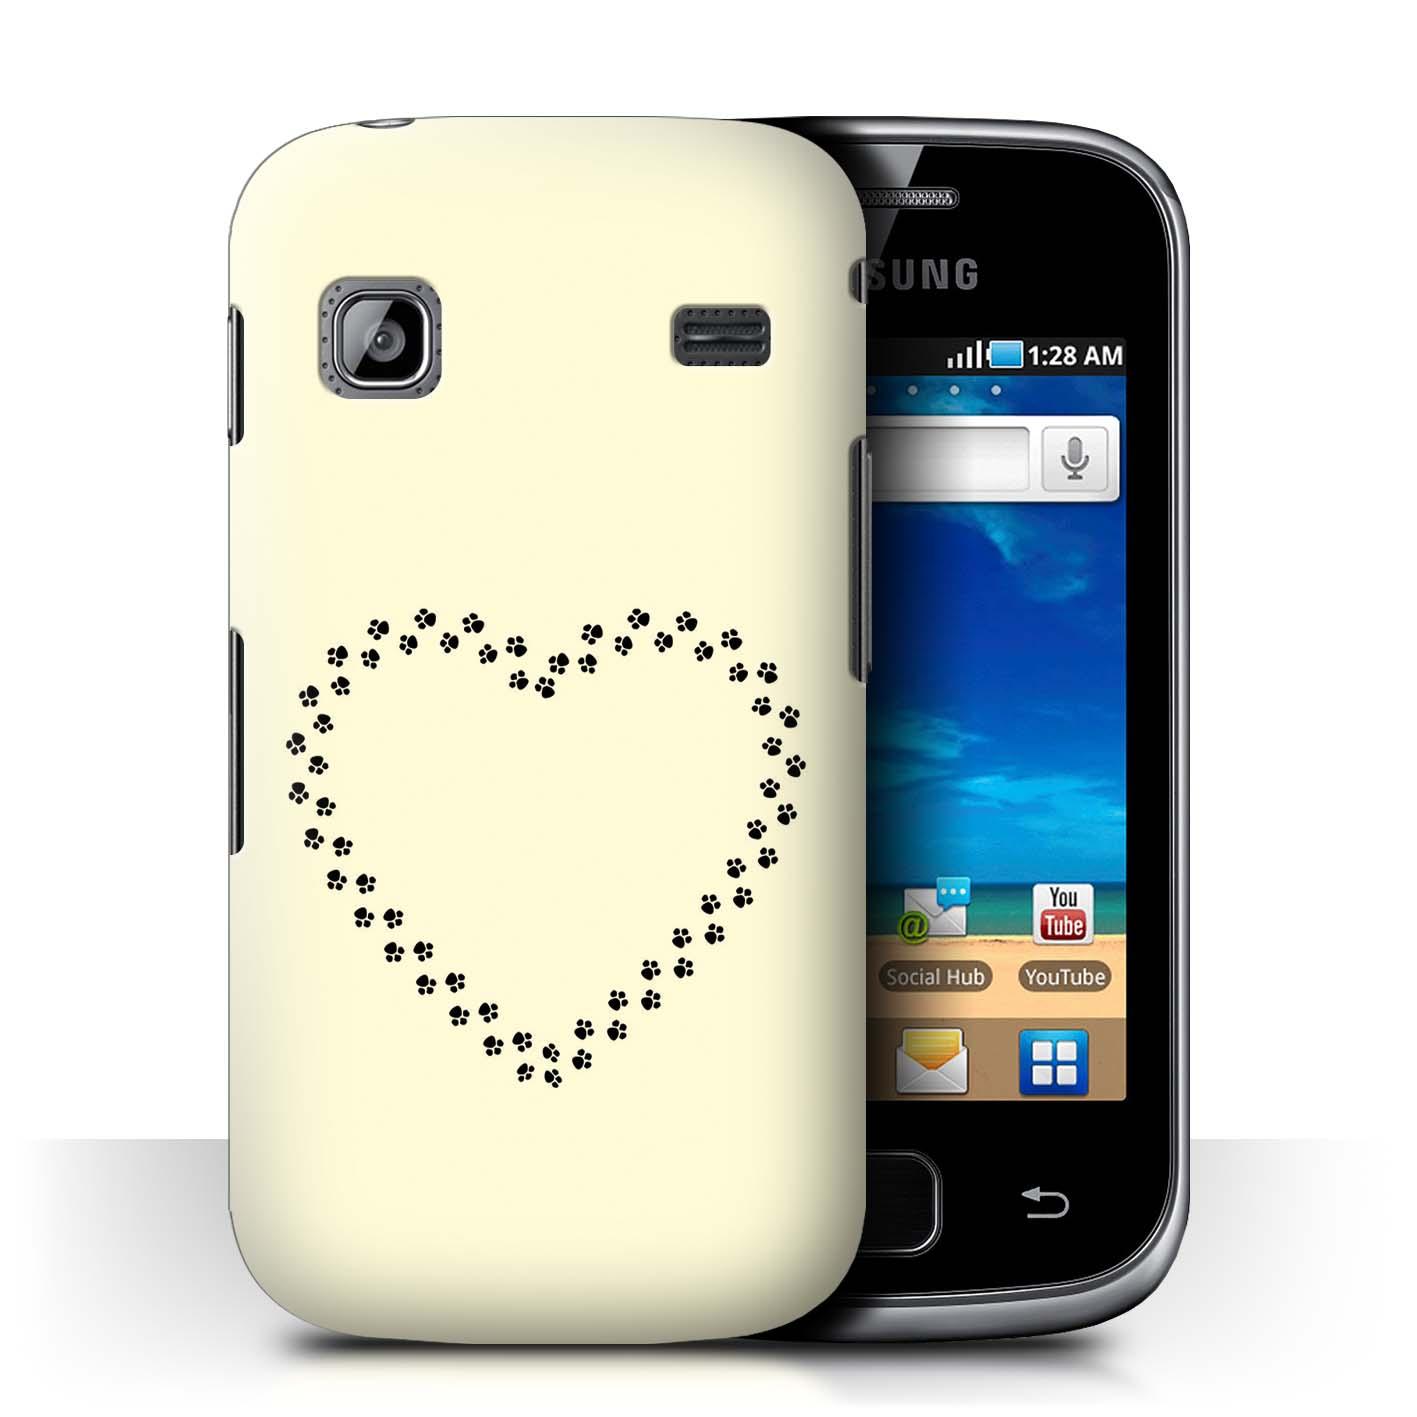 STUFF4-Back-Case-Cover-Skin-for-Samsung-Galaxy-Gio-S5660-Cute-Cartoon-Cat